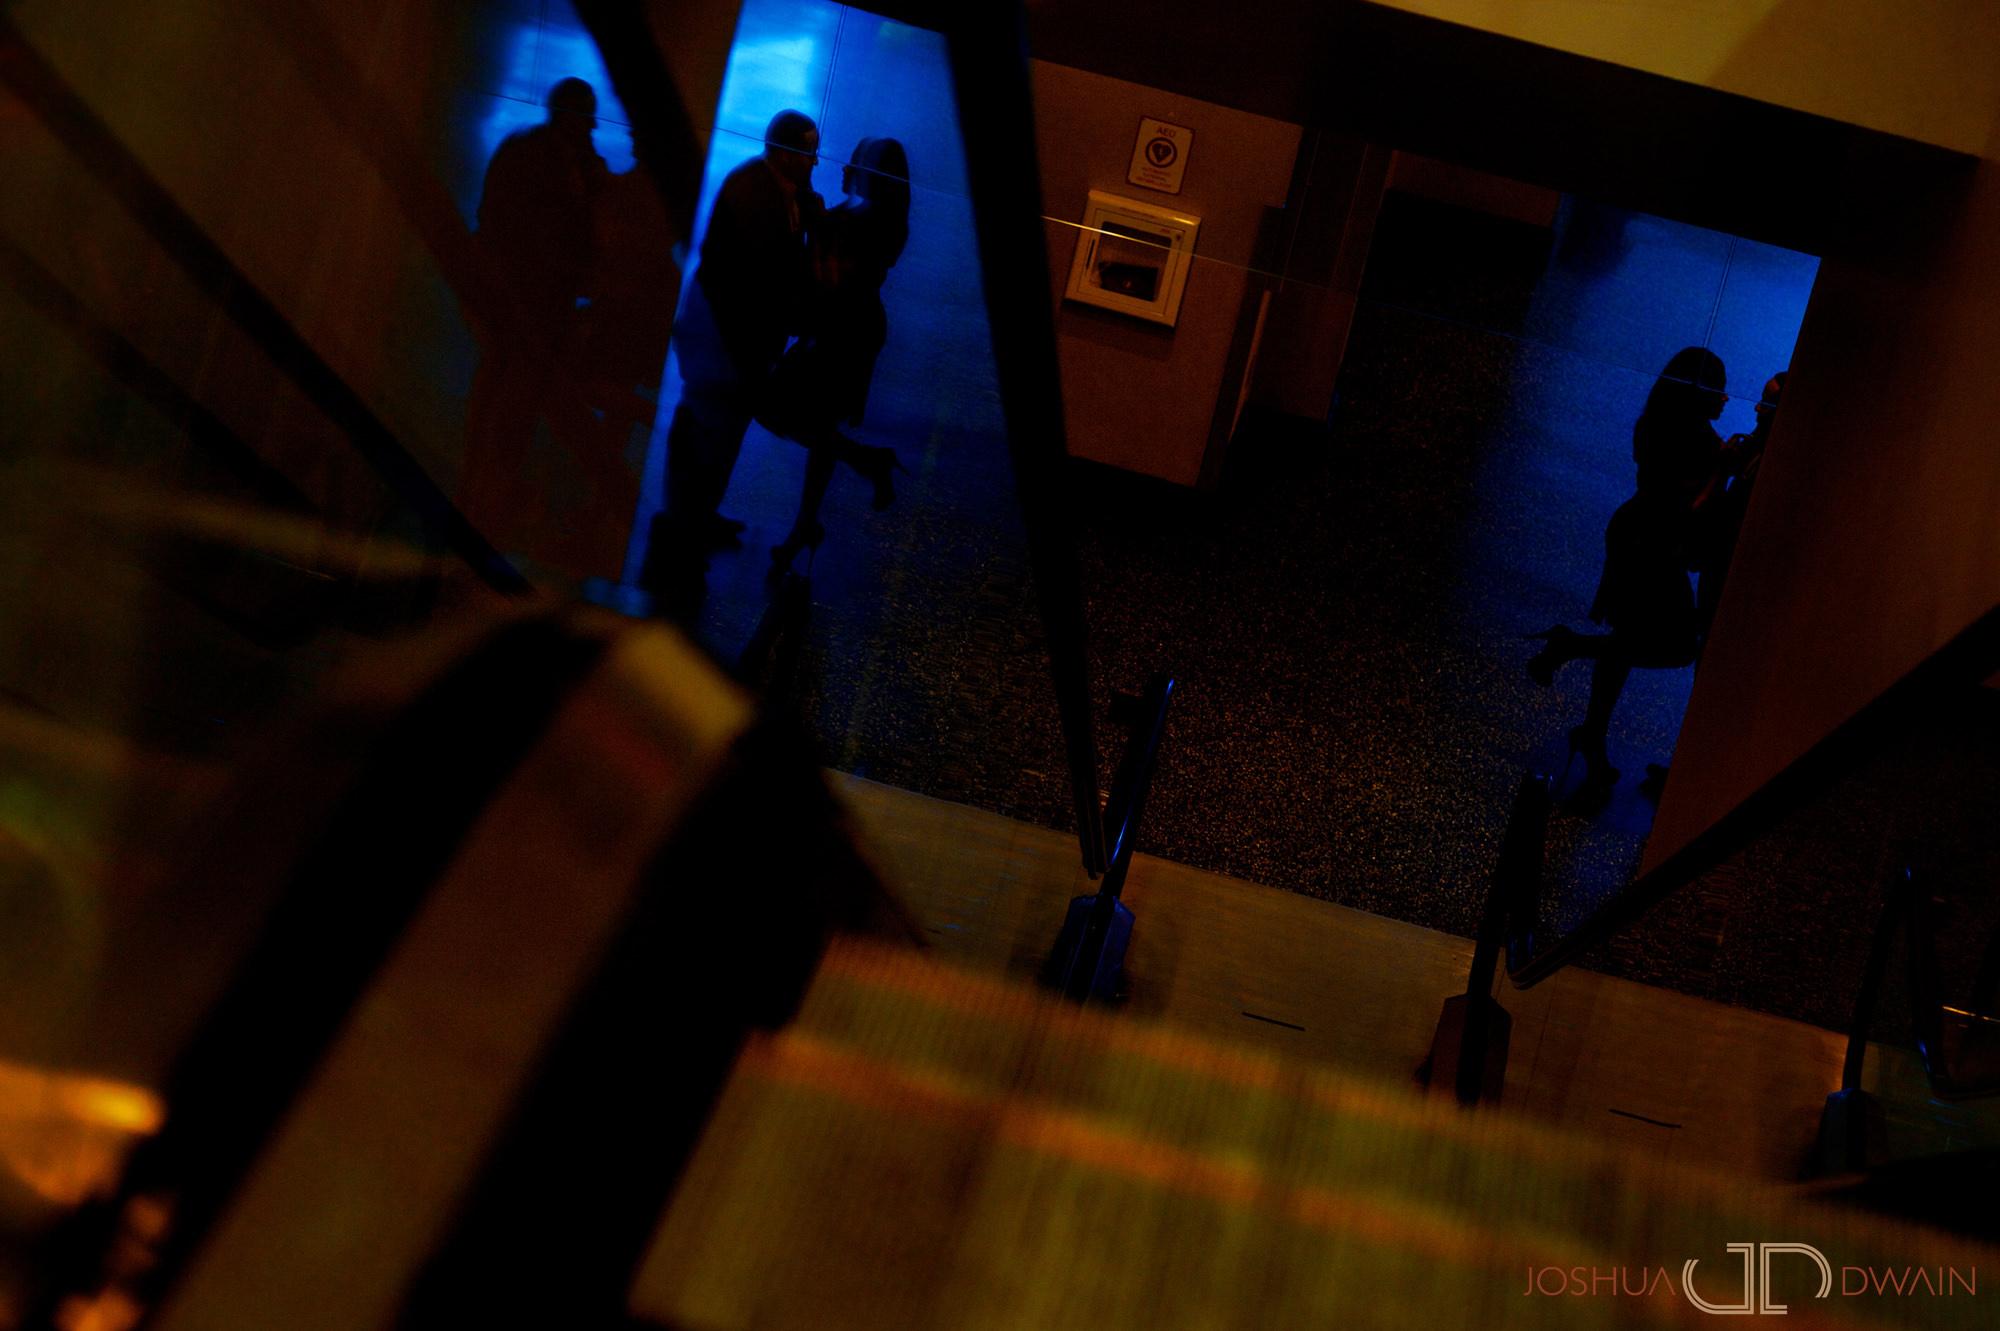 shakinah-darmel-007-new-york-library-engagement-photographer-joshua-dwain-2012-09-06_sd_044